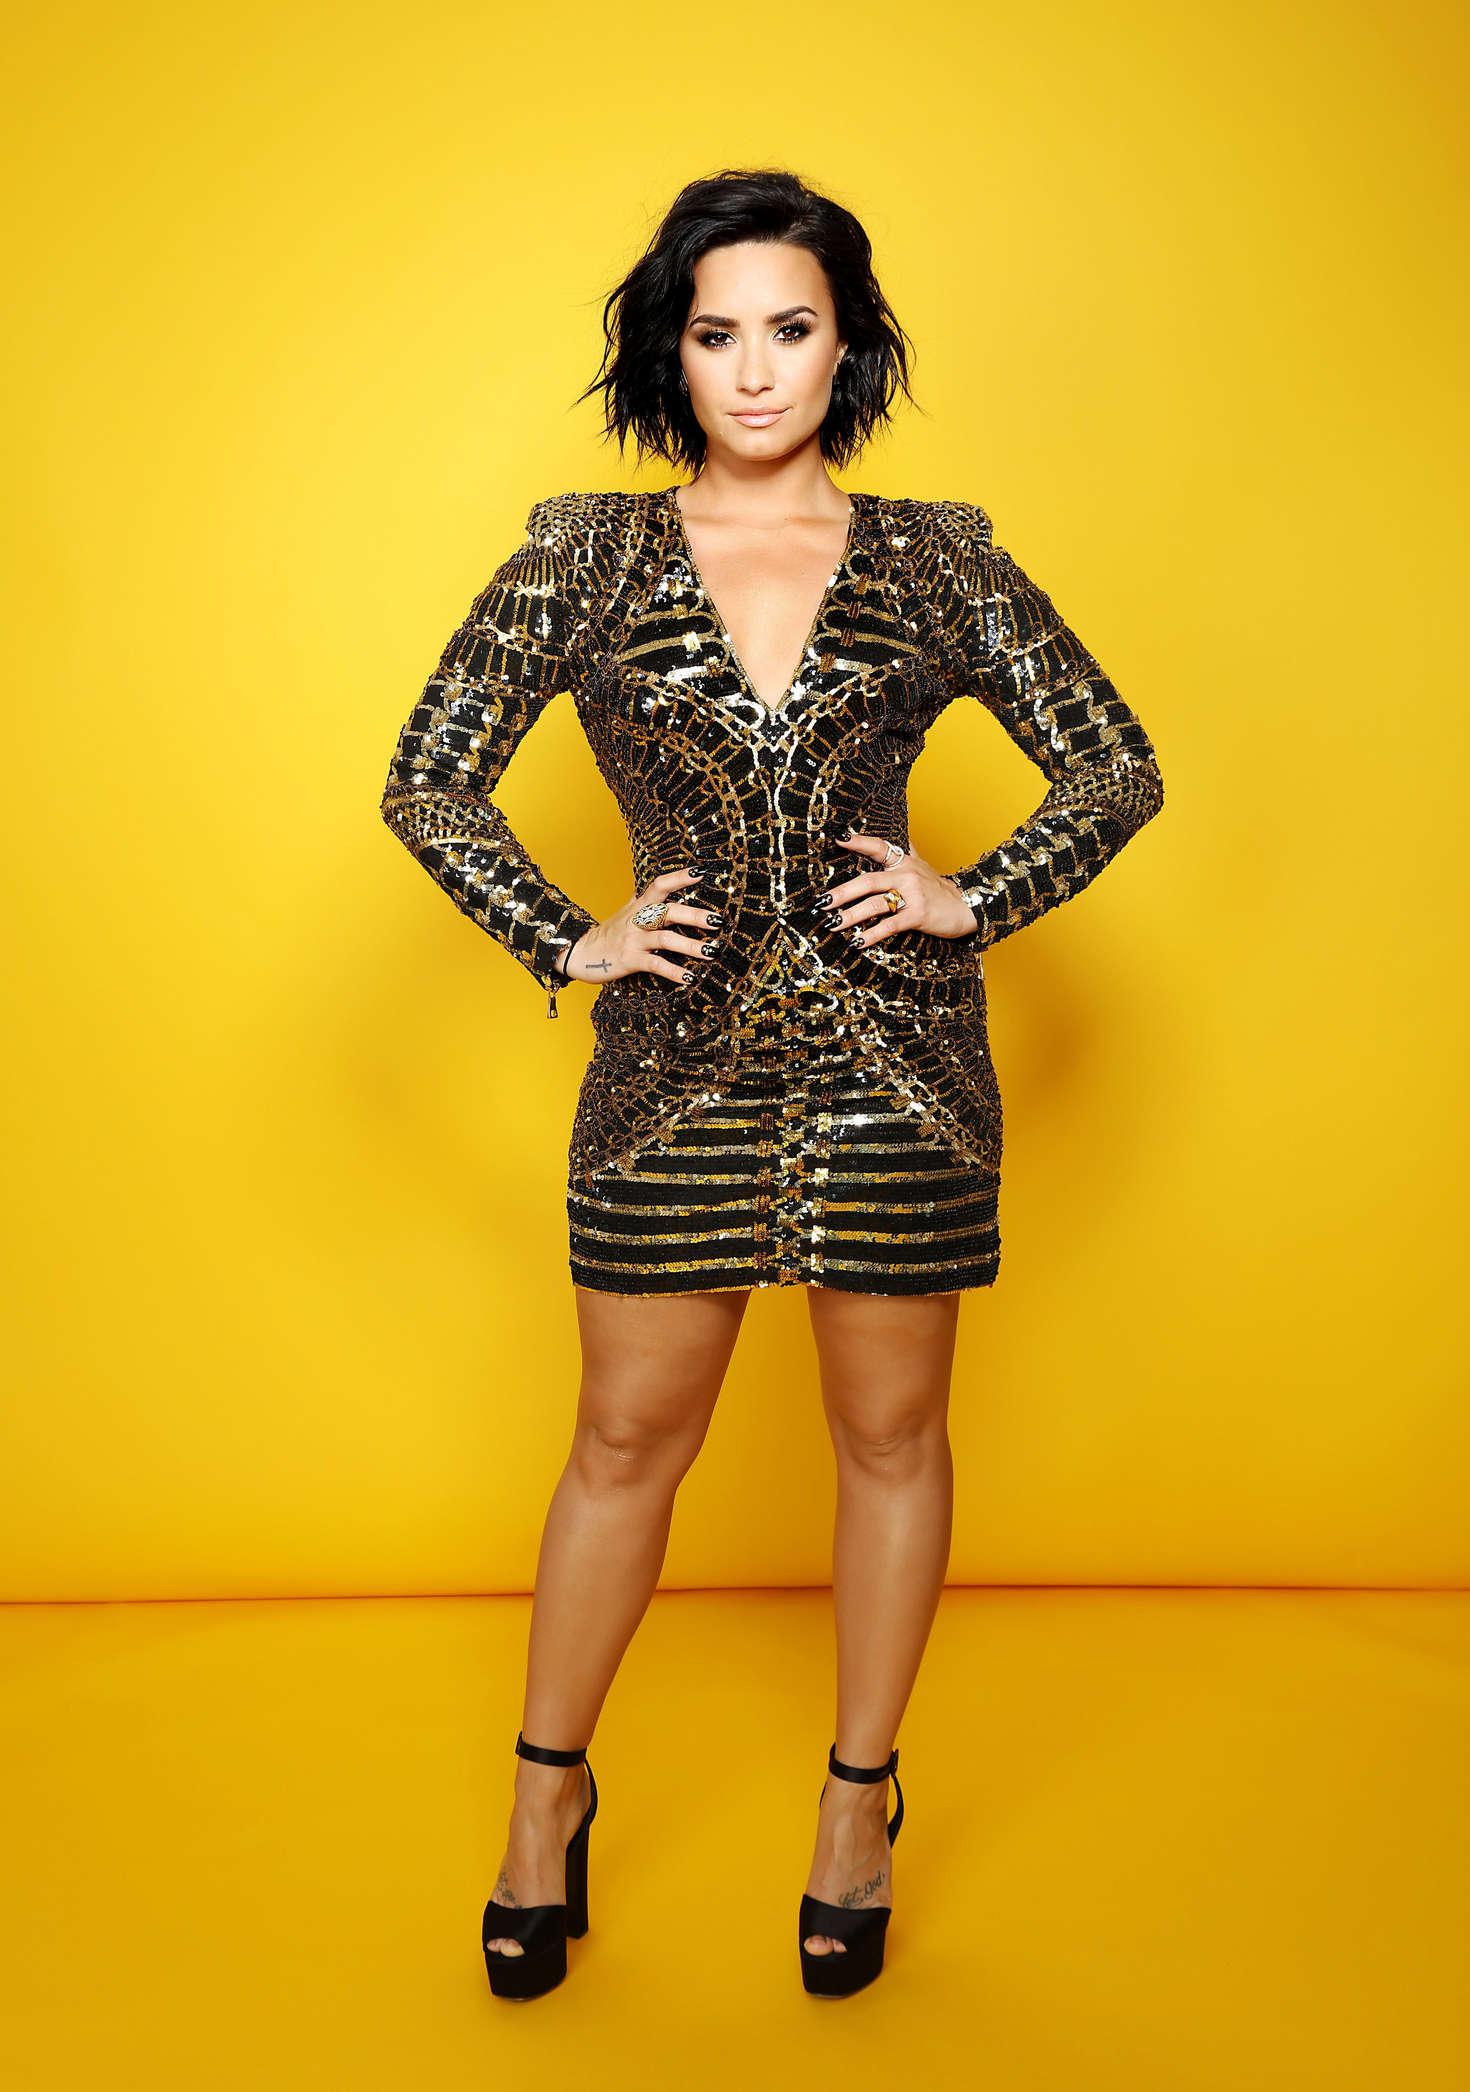 Demi Lovato Backstage Portrait Studio 102 Kiis Fms 06 Actors